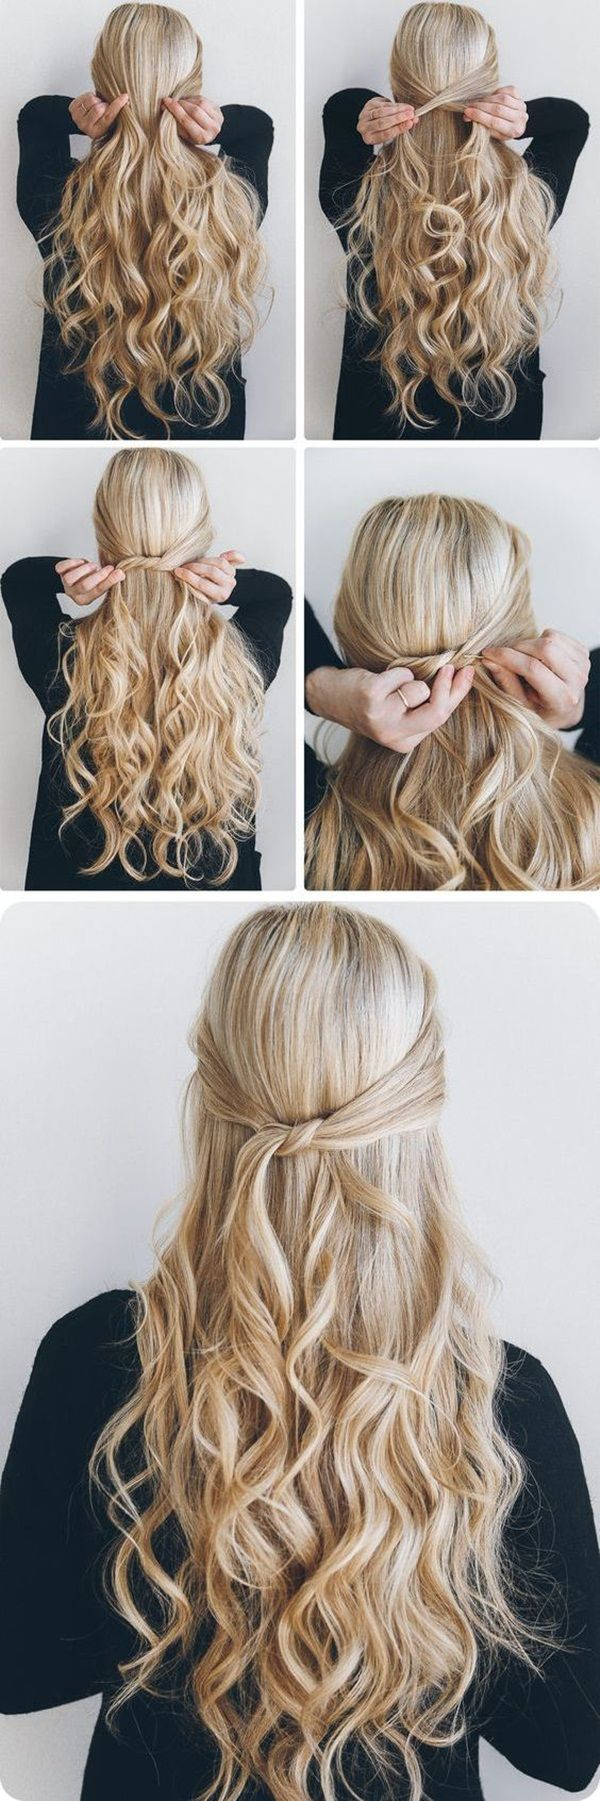 40 Easy Hairstyles for Schools to Try in 2016 | www.barneyfrank.n...